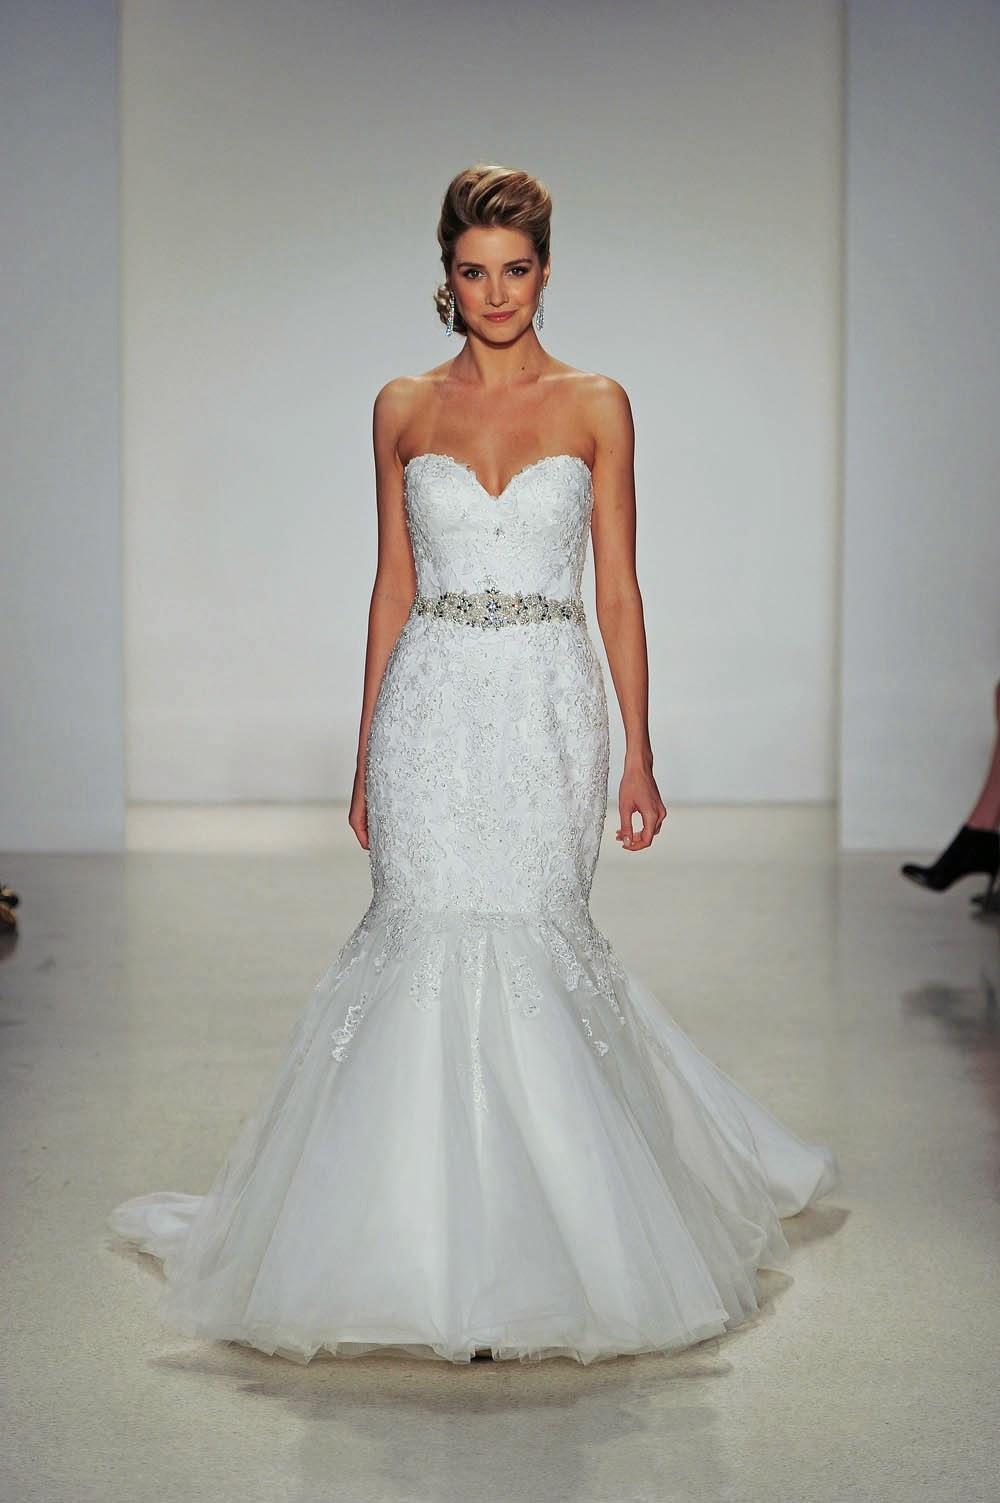 2.Alfred%2BAngelo%2BFall%2B2015%2BWedding%2BDresses - Alfred Angelo Wedding Dresses